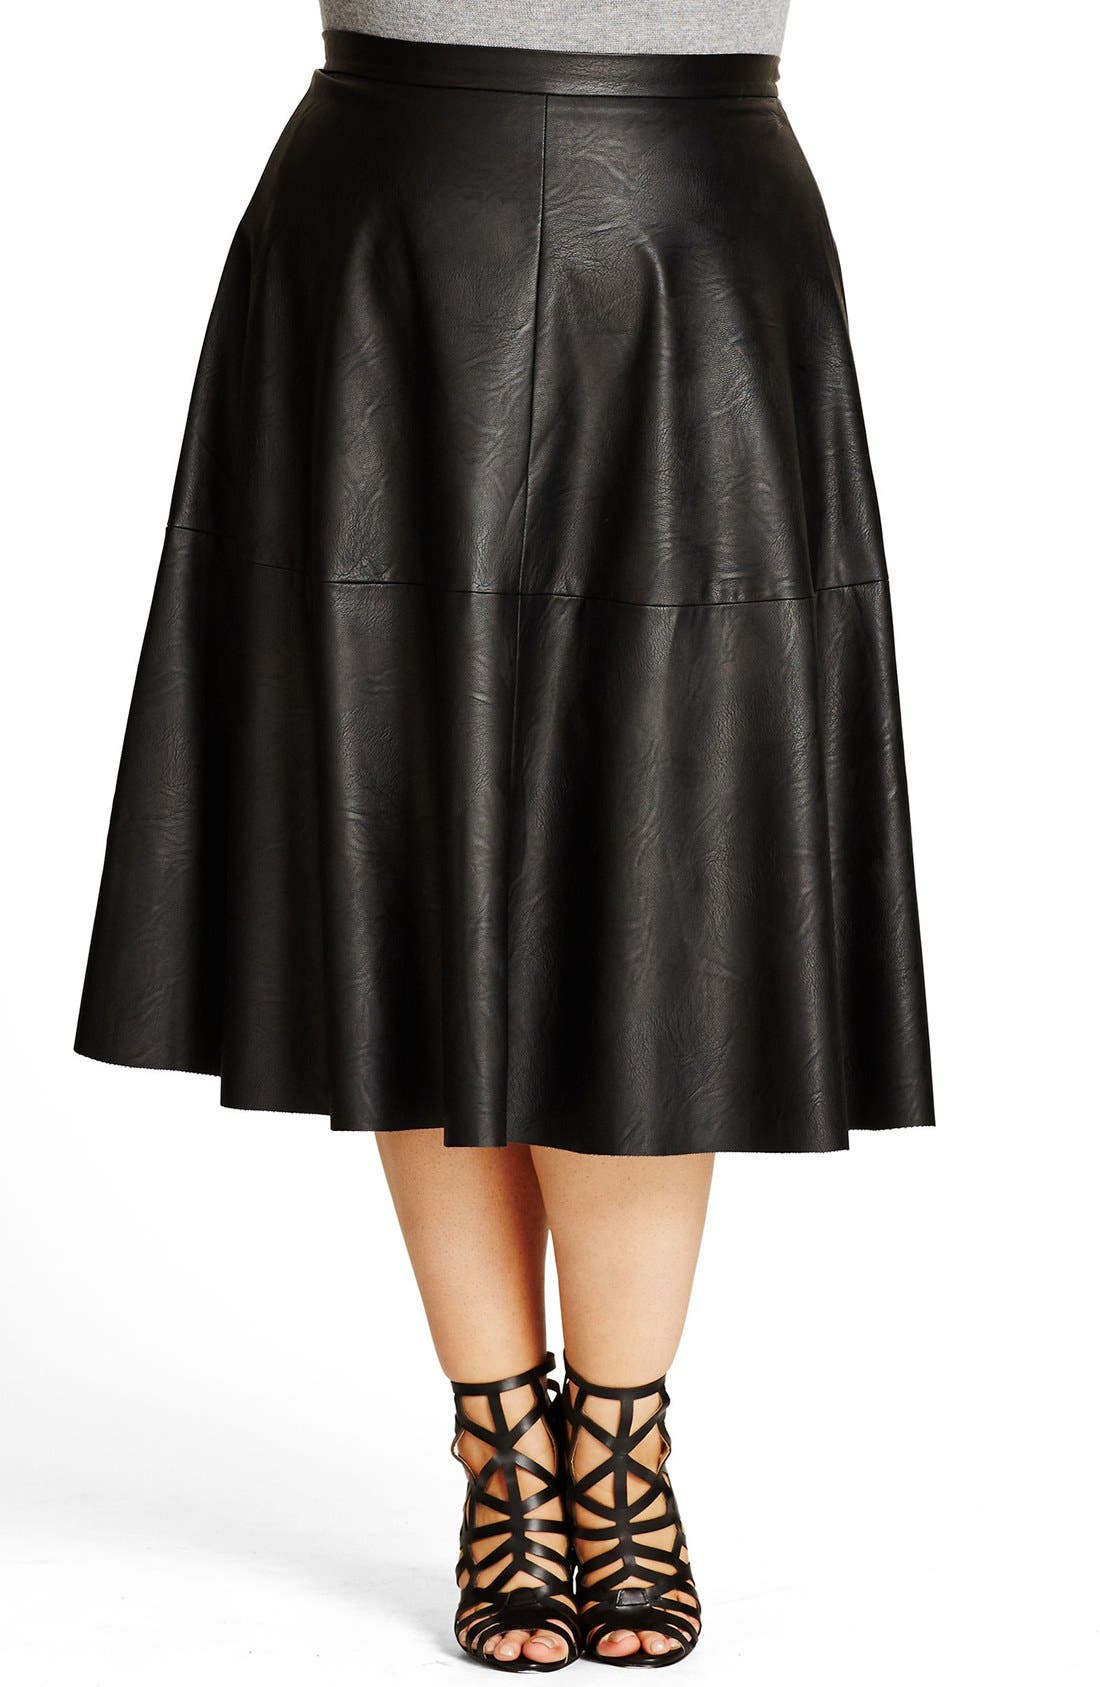 Alternate Image 1 Selected - City Chic 'Flirt' Faux Leather Midi Skirt (Plus Size)